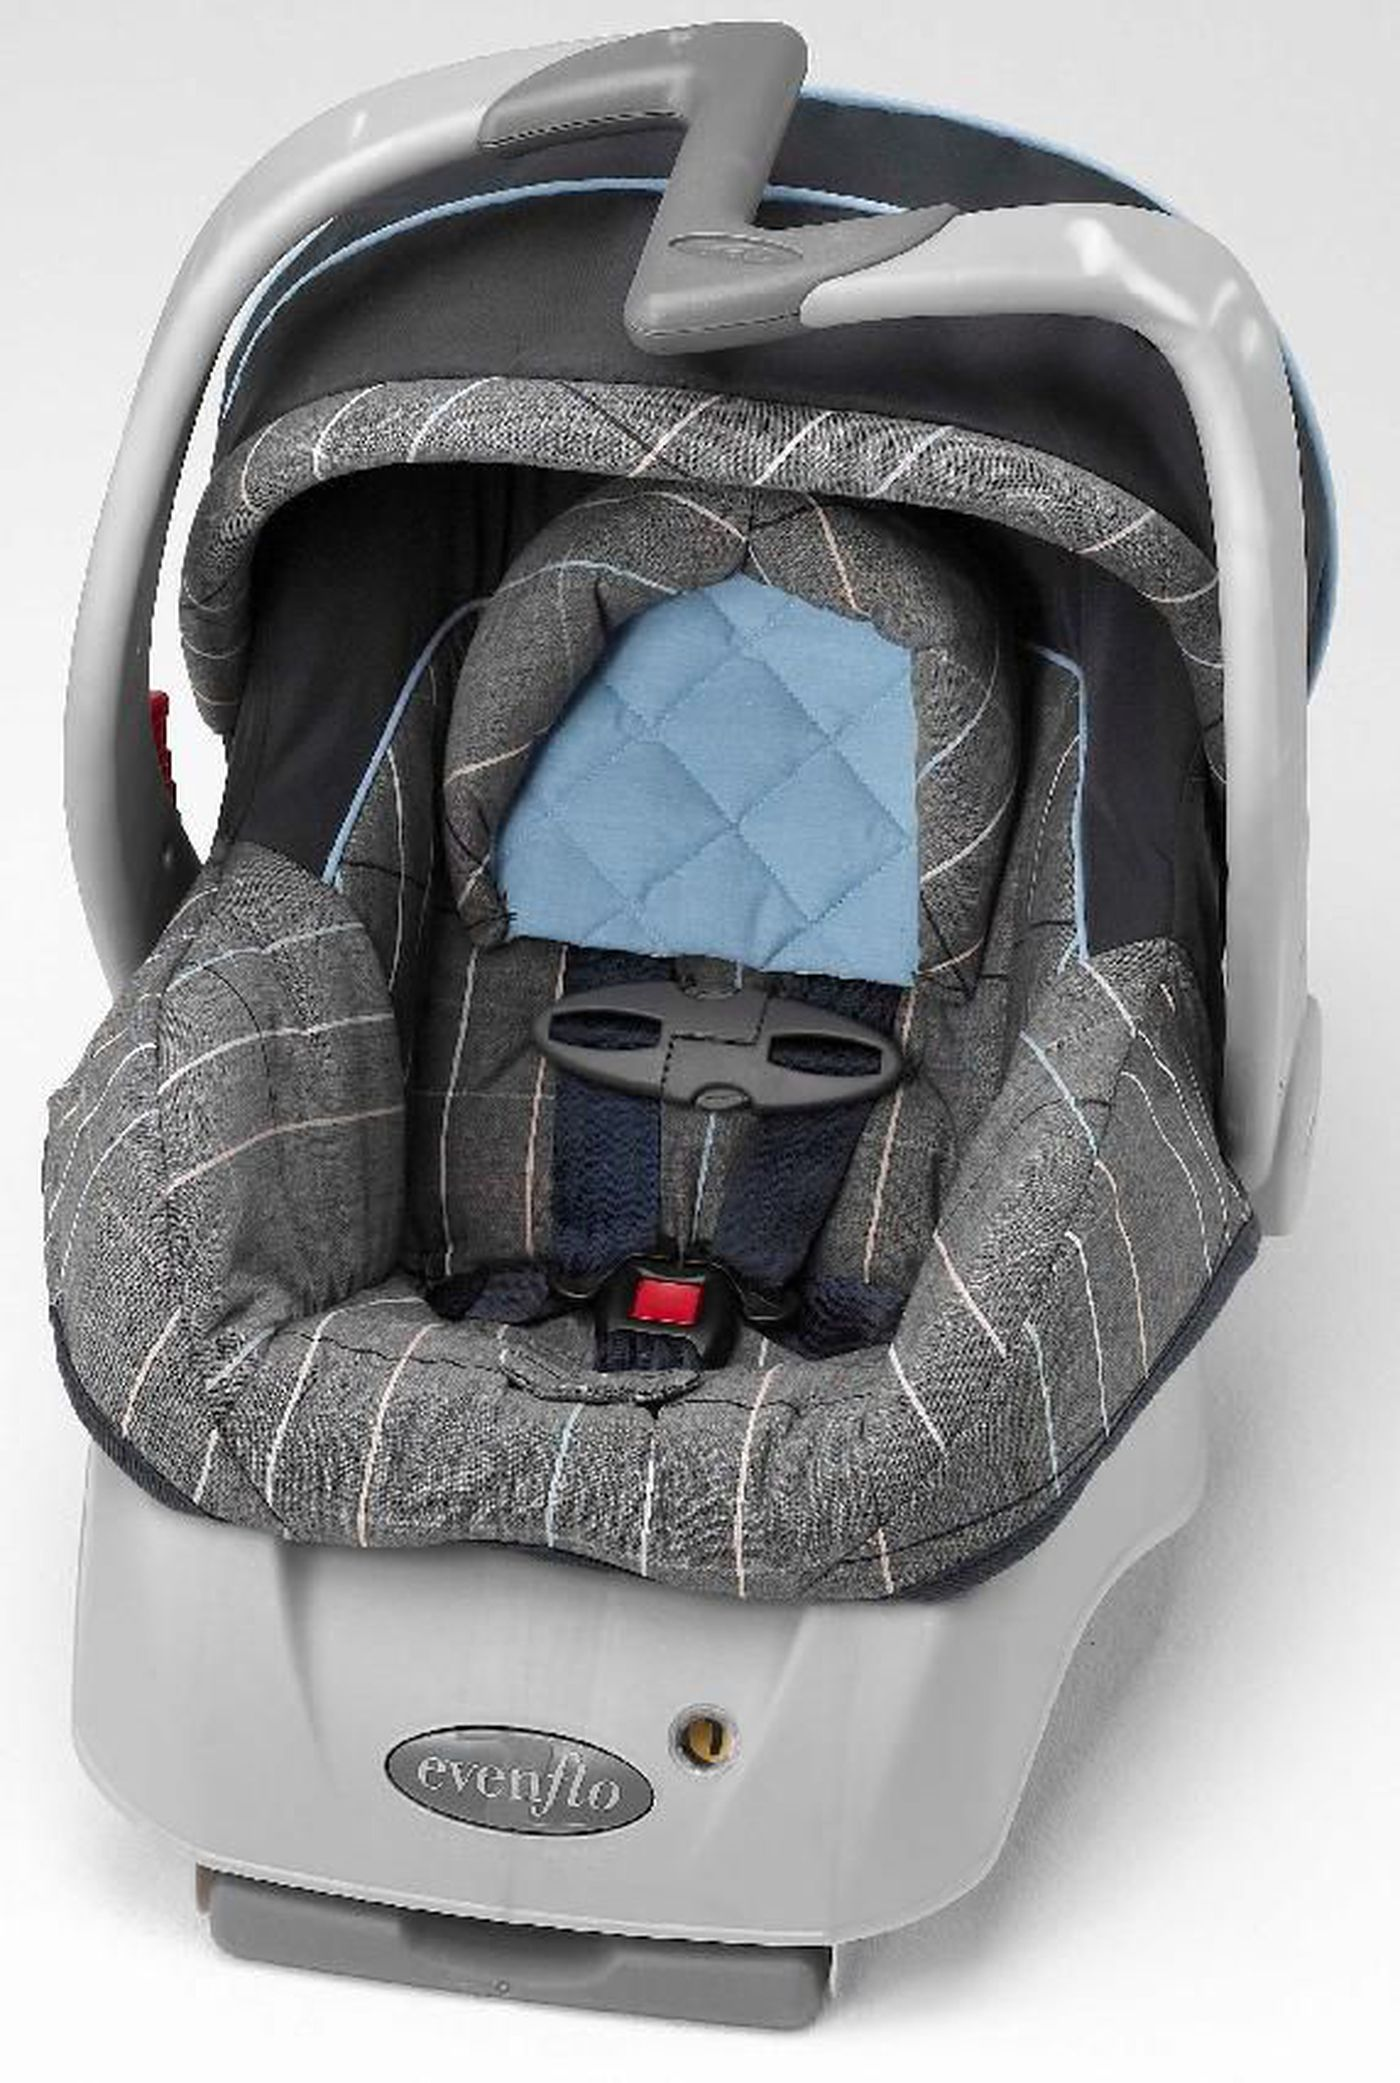 Child Car Seat Recall